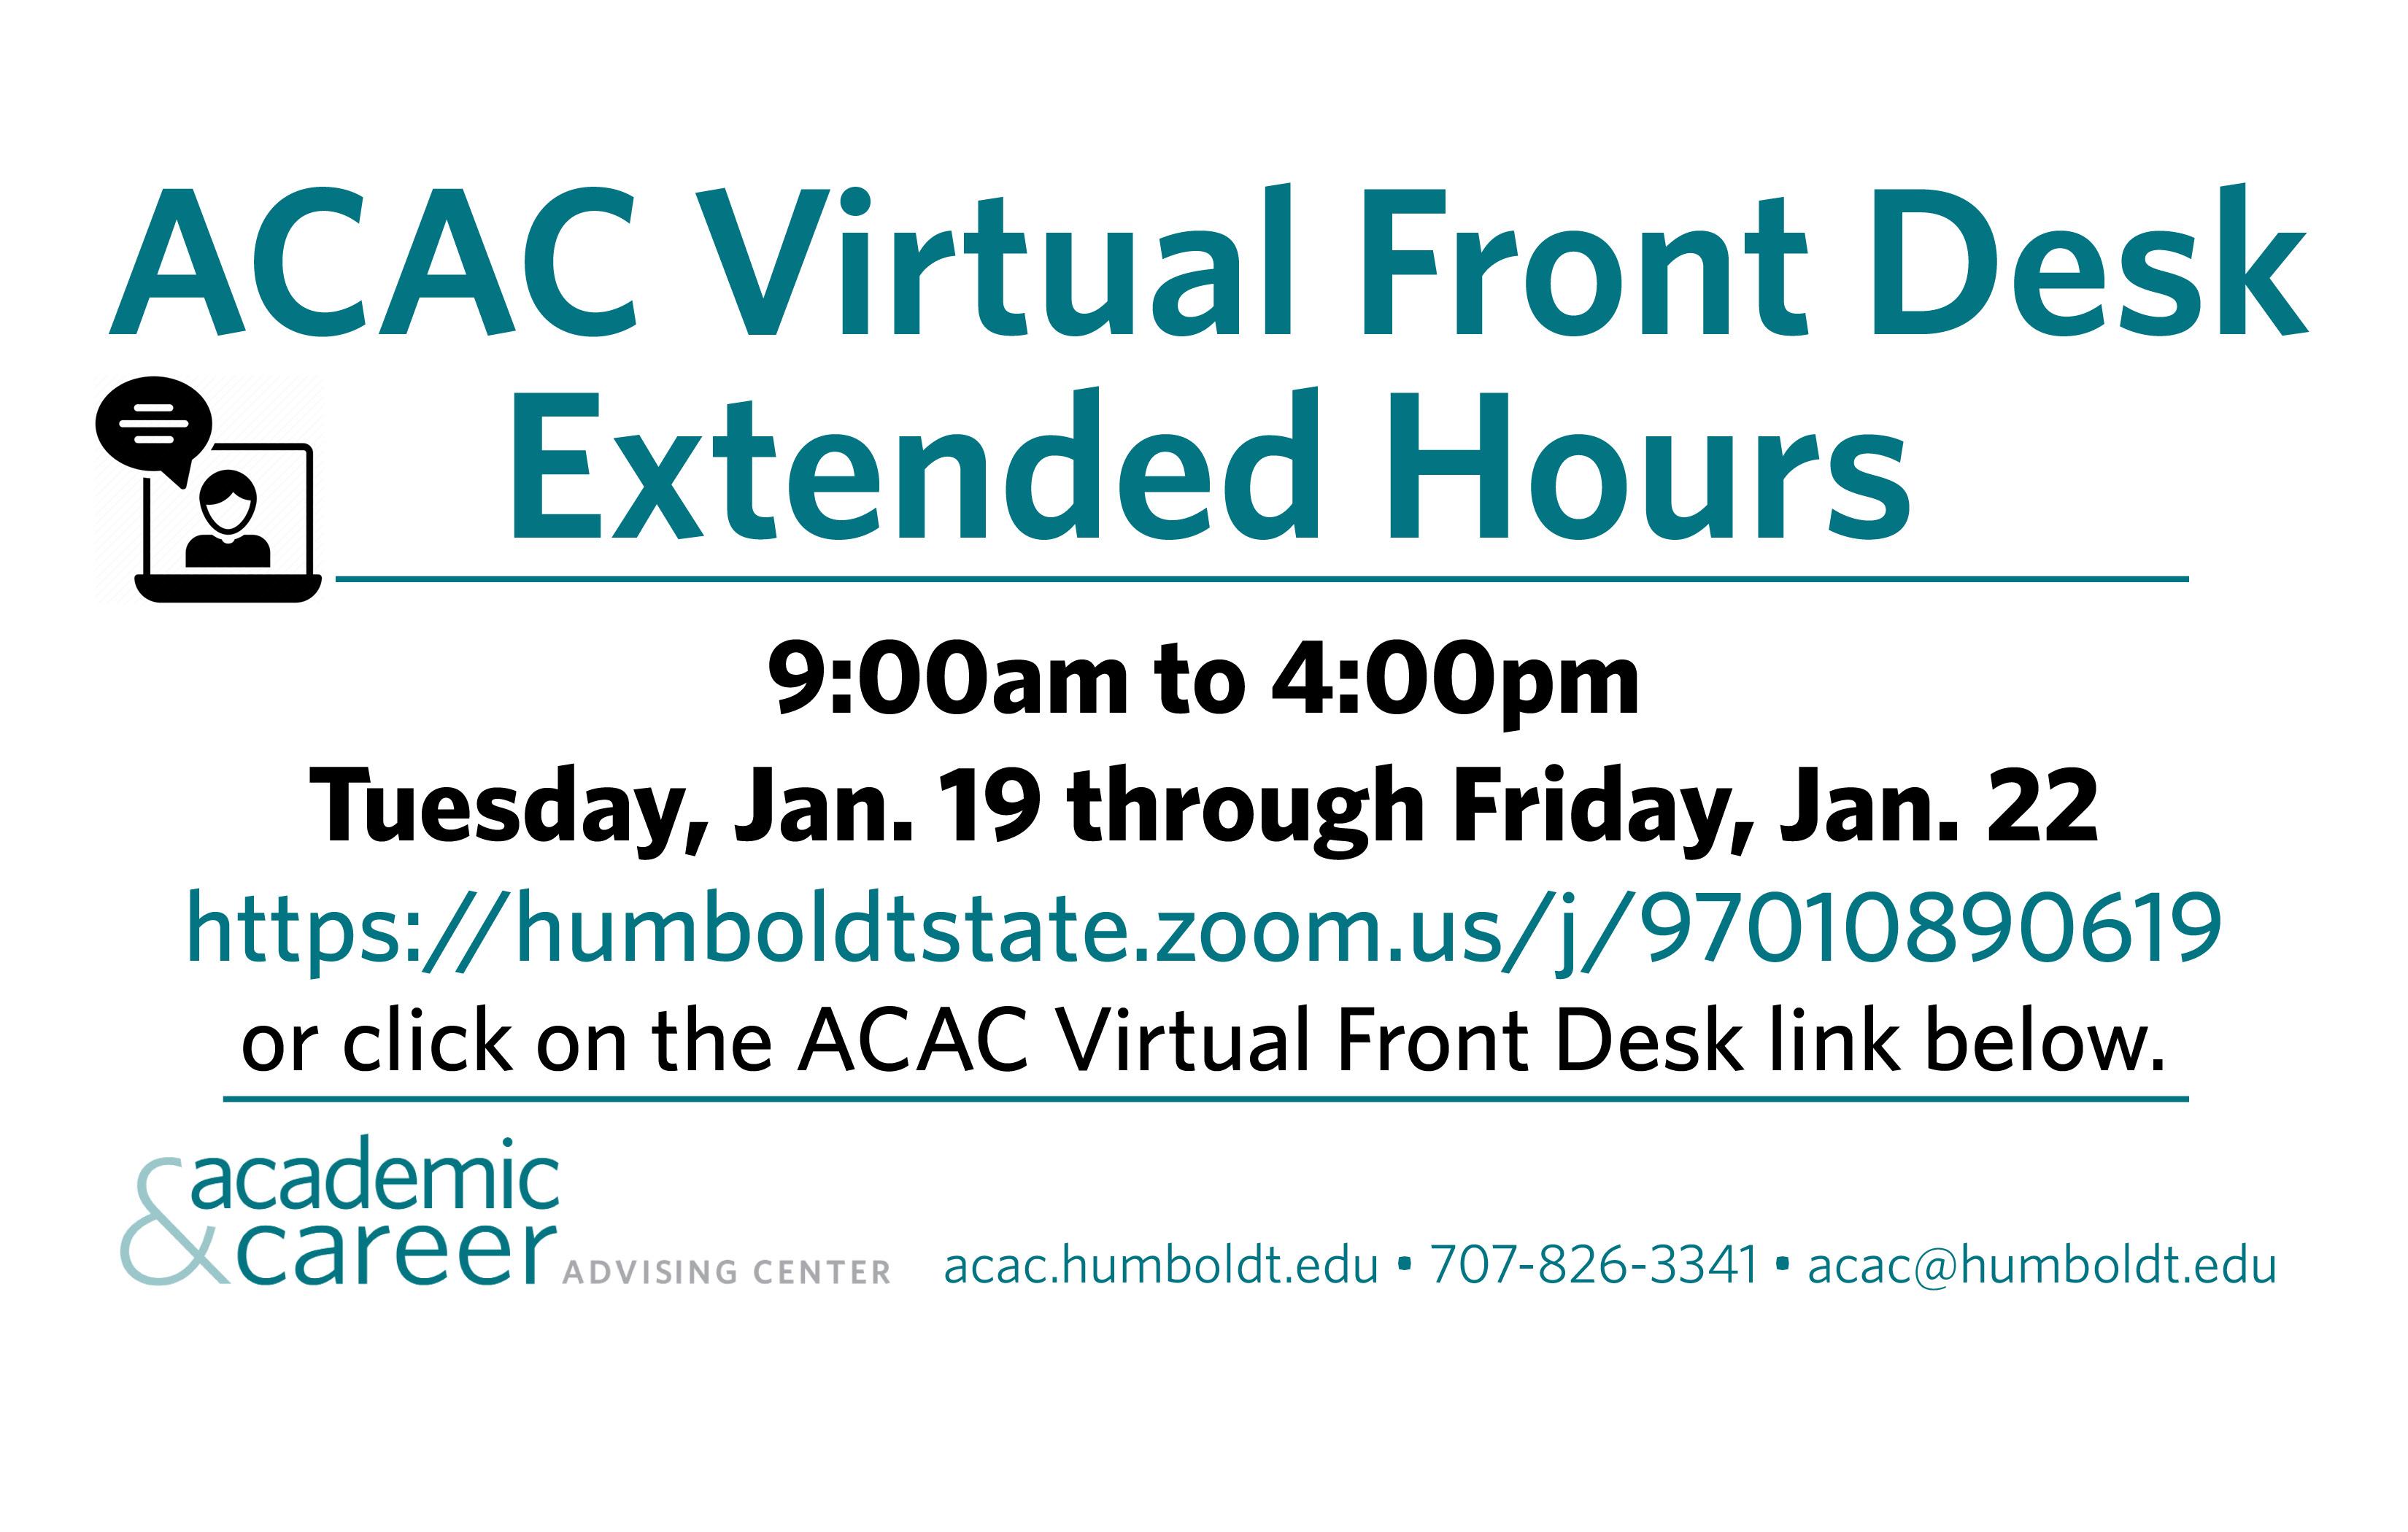 virtual front desk zoom humboldtstate.zoom.us/j/97010890619 extended hours this week